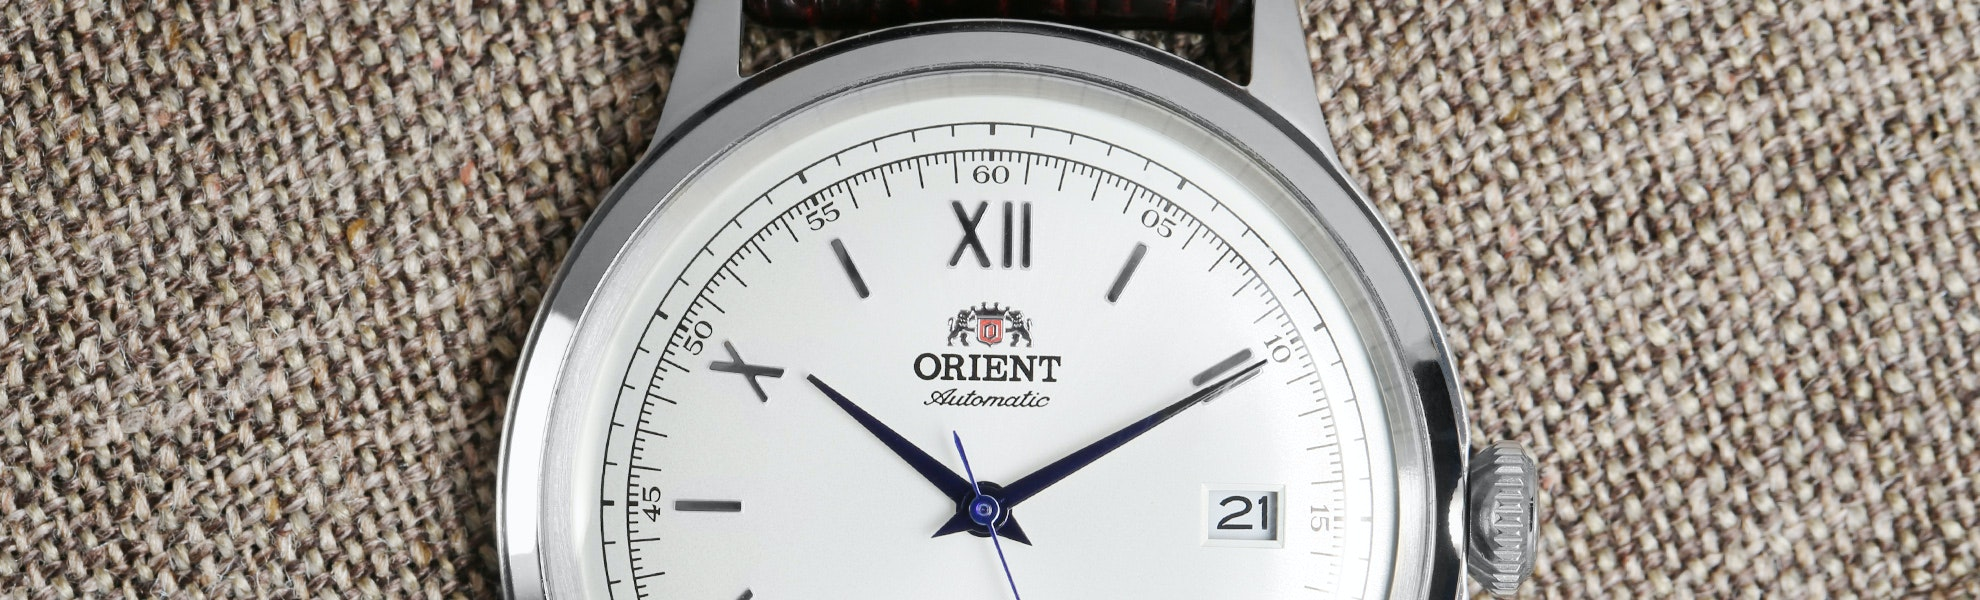 Orient Bambino (Version 2) Watch